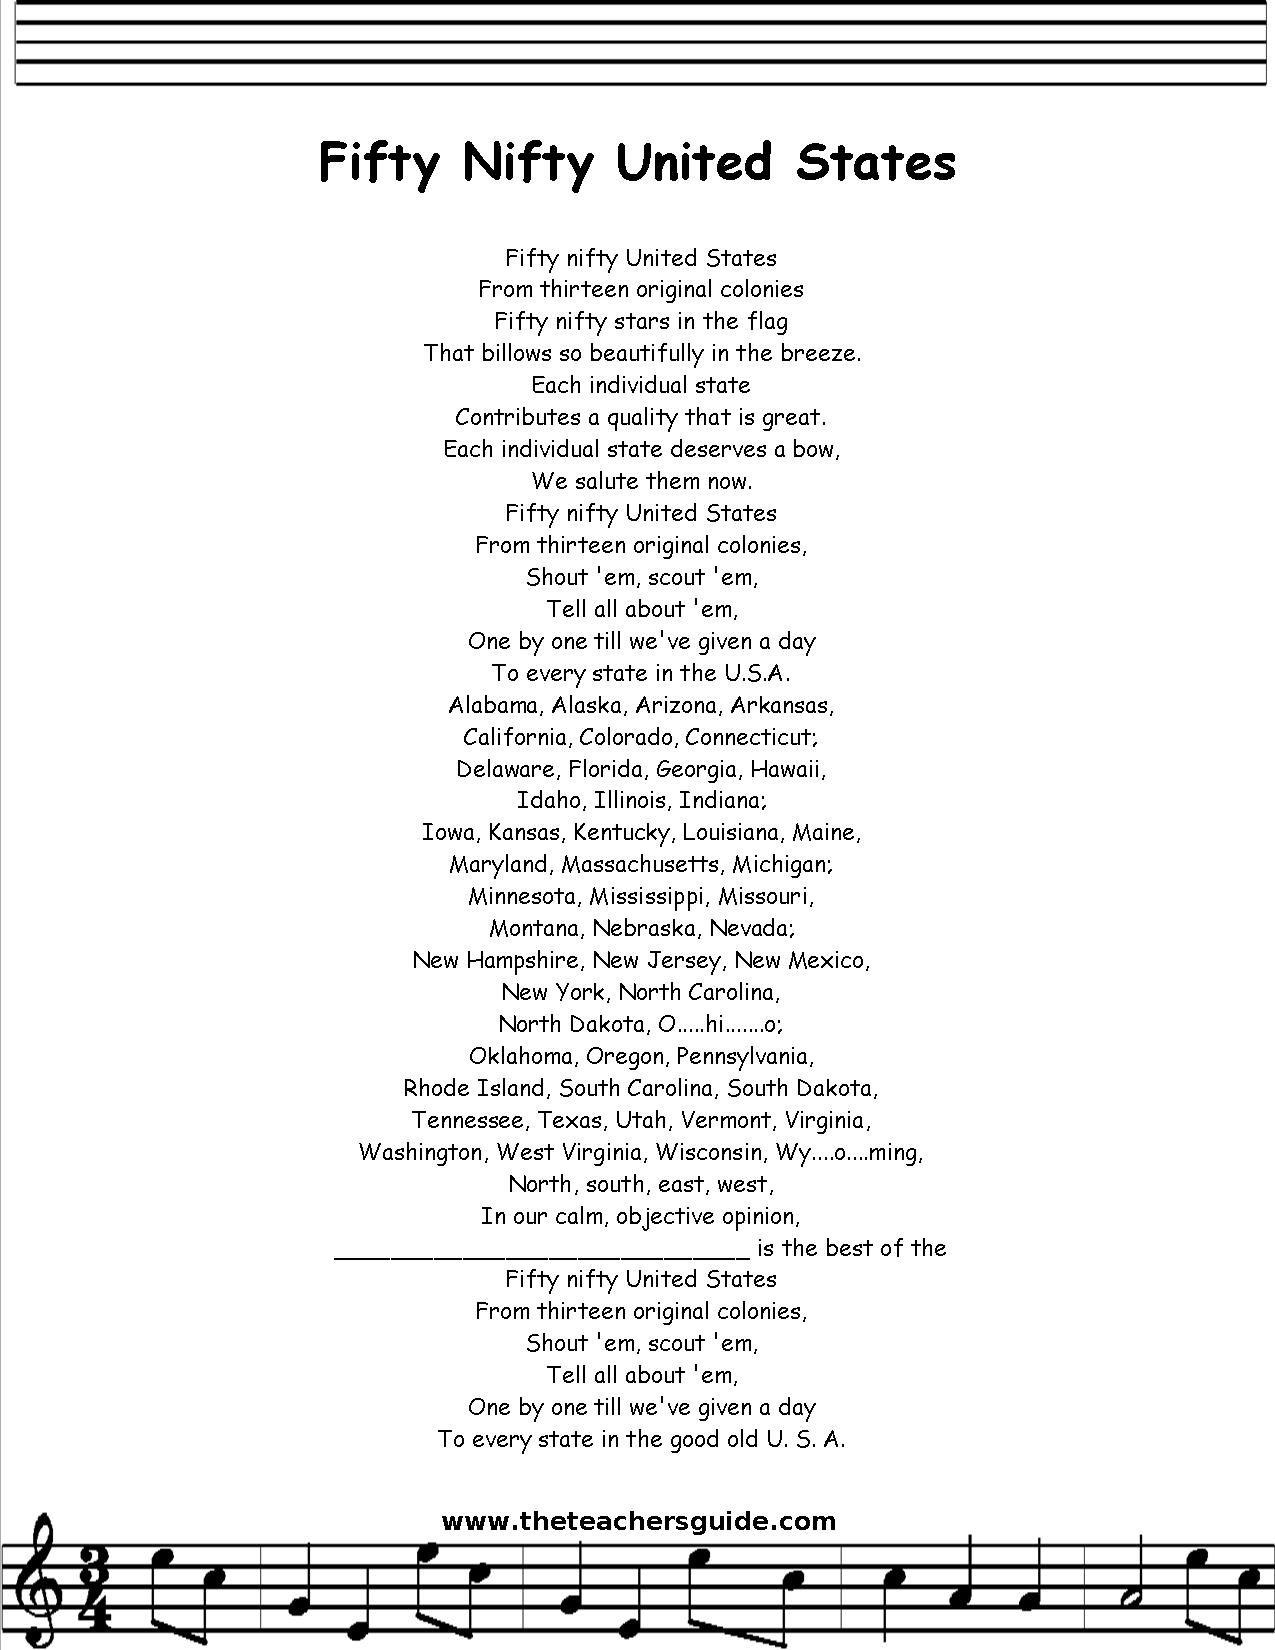 50 Nifty United States Lyrics